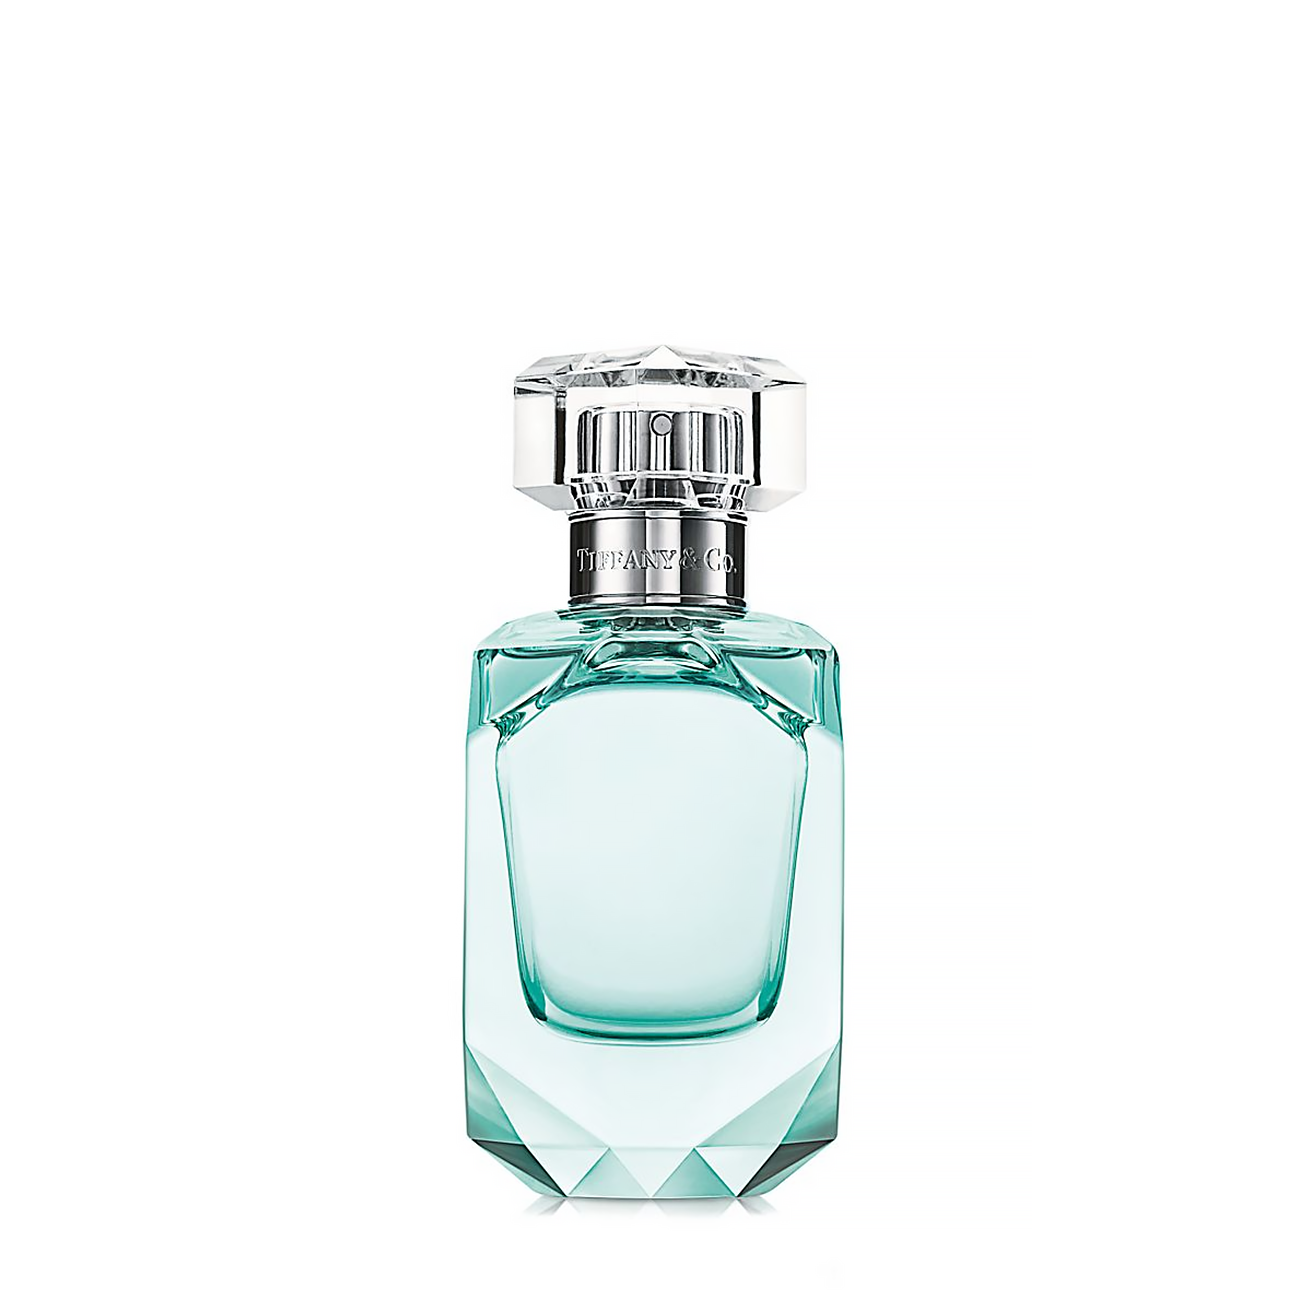 Tiffany & Co.Intense 50ml Tiffany & Co. imagine 2021 bestvalue.eu